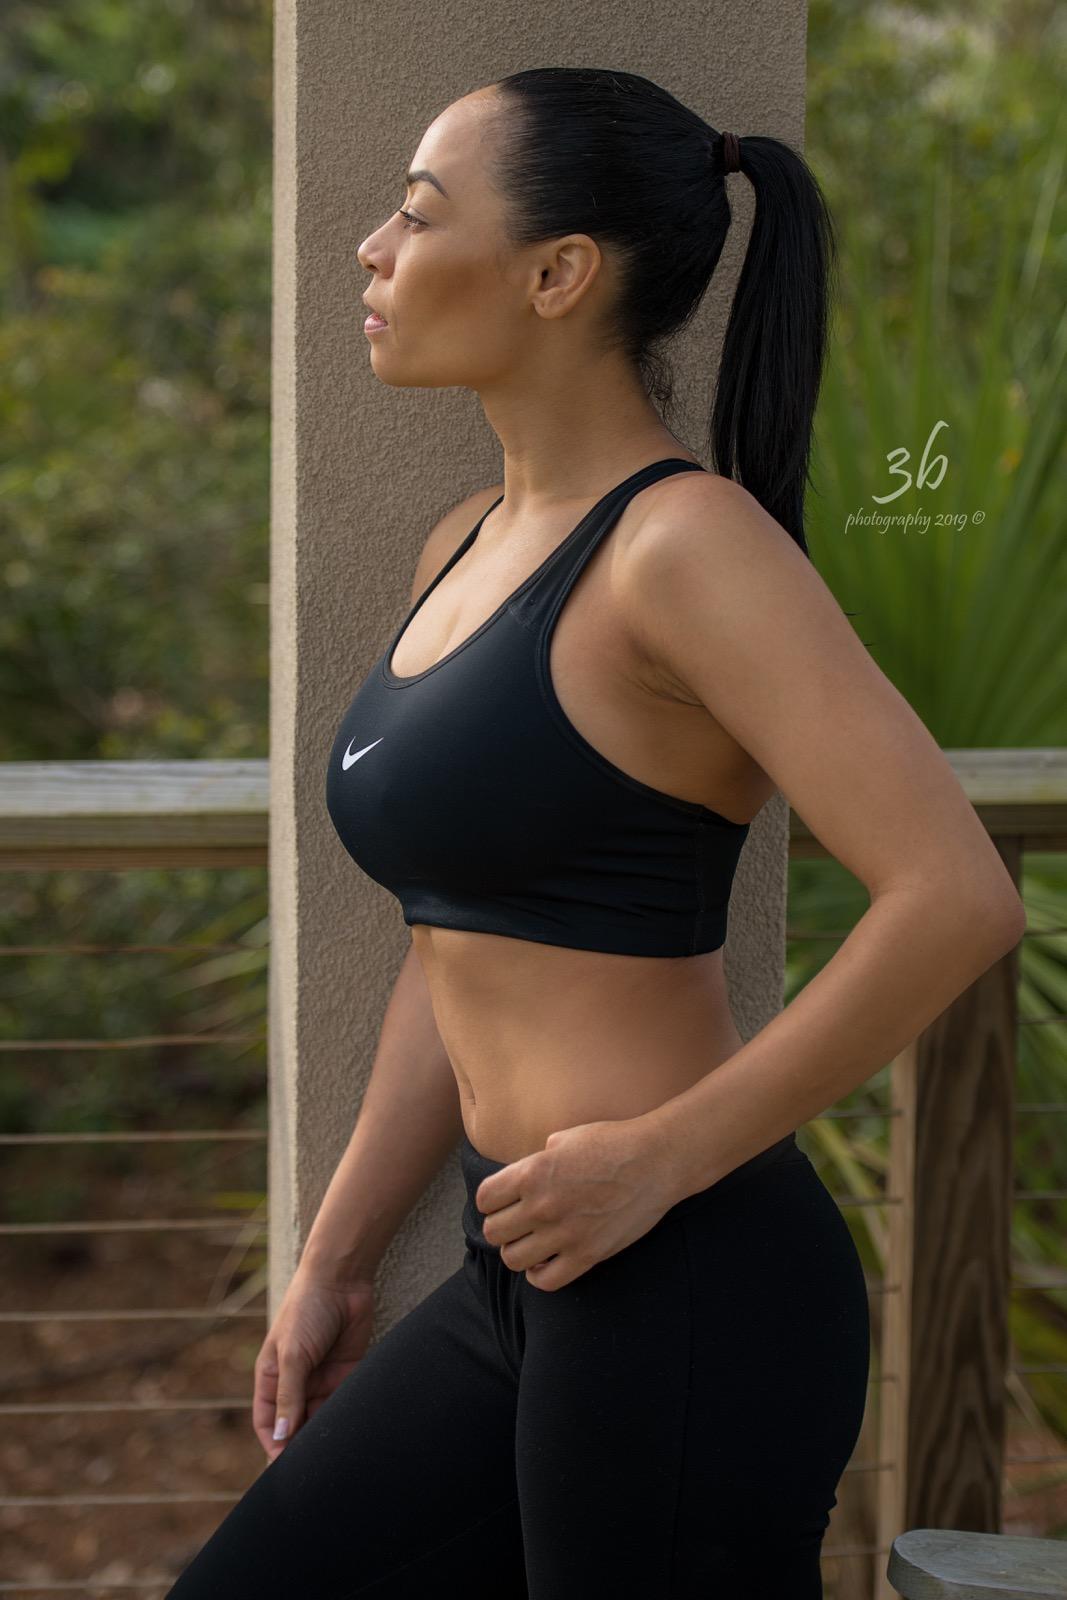 Brandi-Benson-workout-looking-out